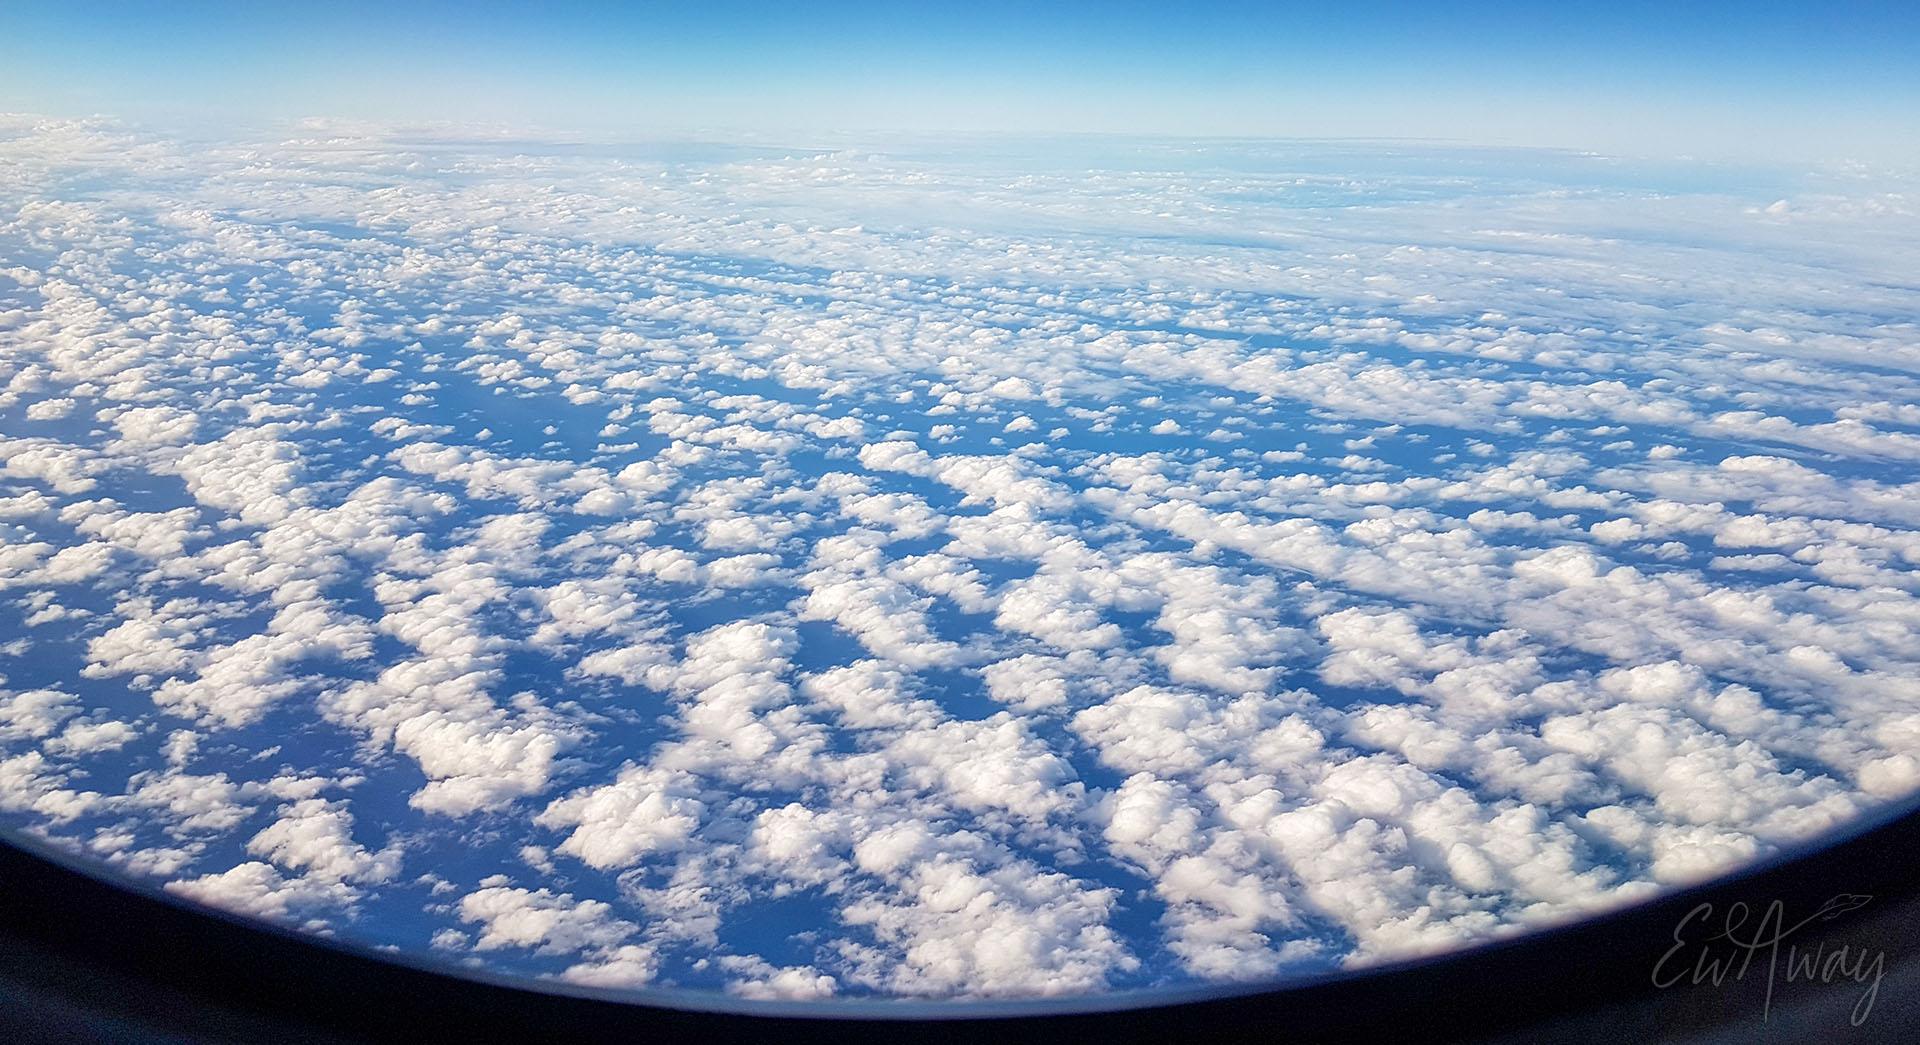 Podróż samolotowa podczas pandemii koronowirusa